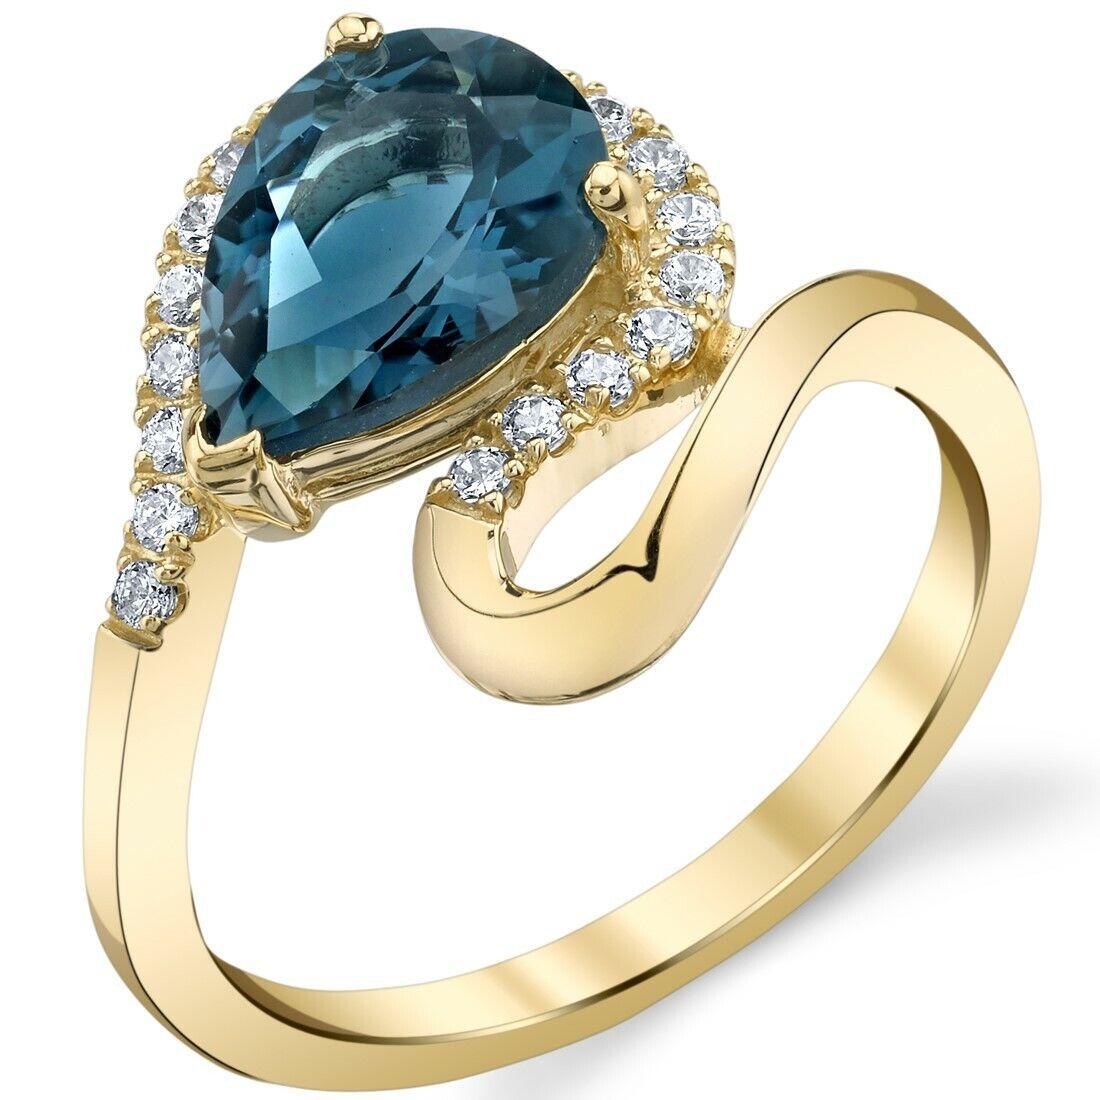 9ct GOLD 14mm SMALL DIAMOND CUT HINGED HOOP SLEEPER EARRINGS PAIR B/'Day GIFT NEW